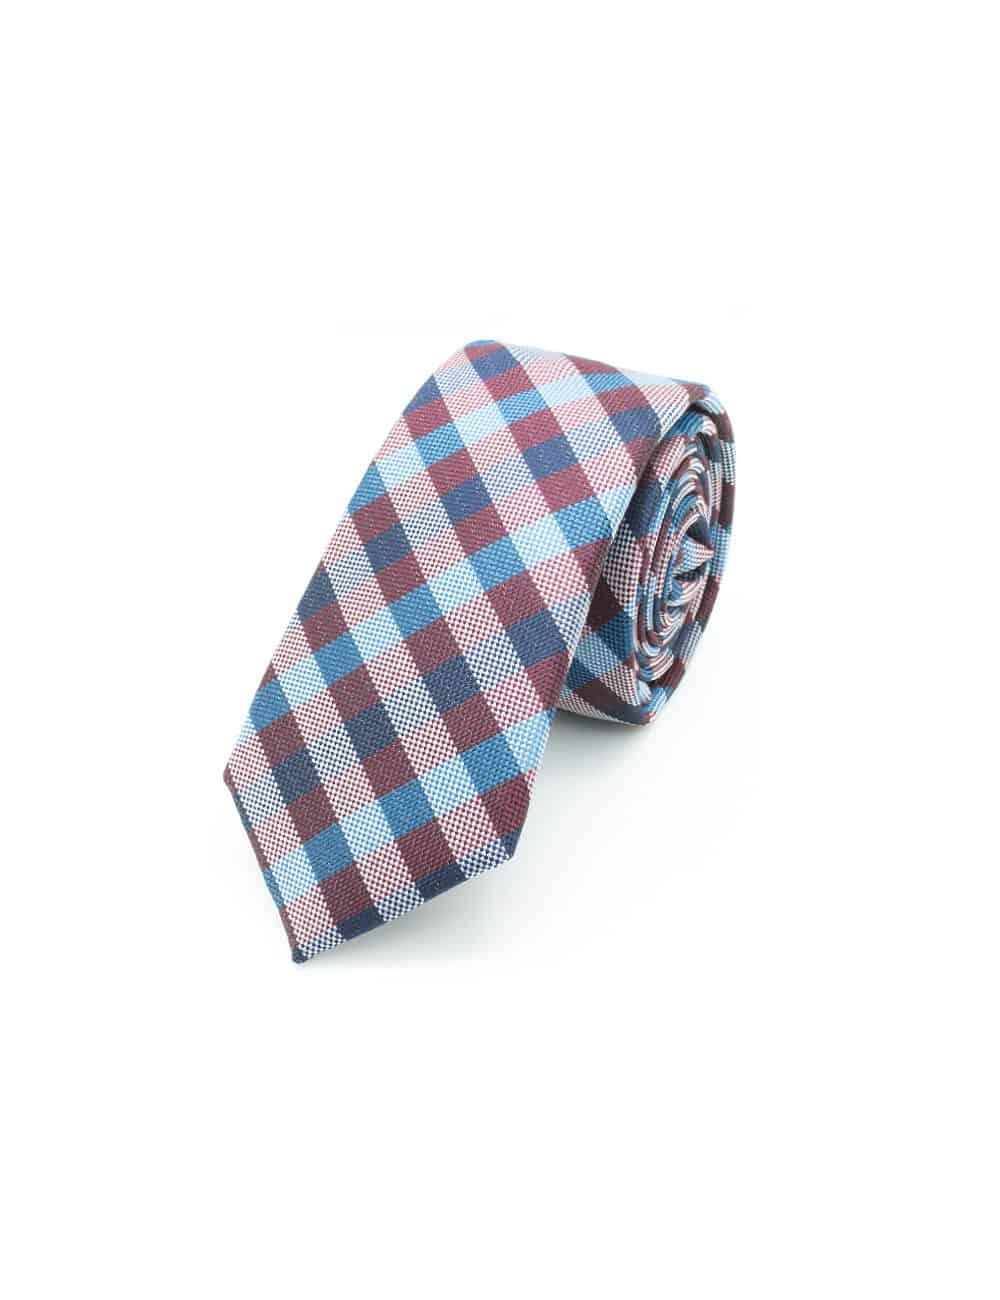 Navy/ Red/ Blue Spill Resist Woven Necktie NT53.9